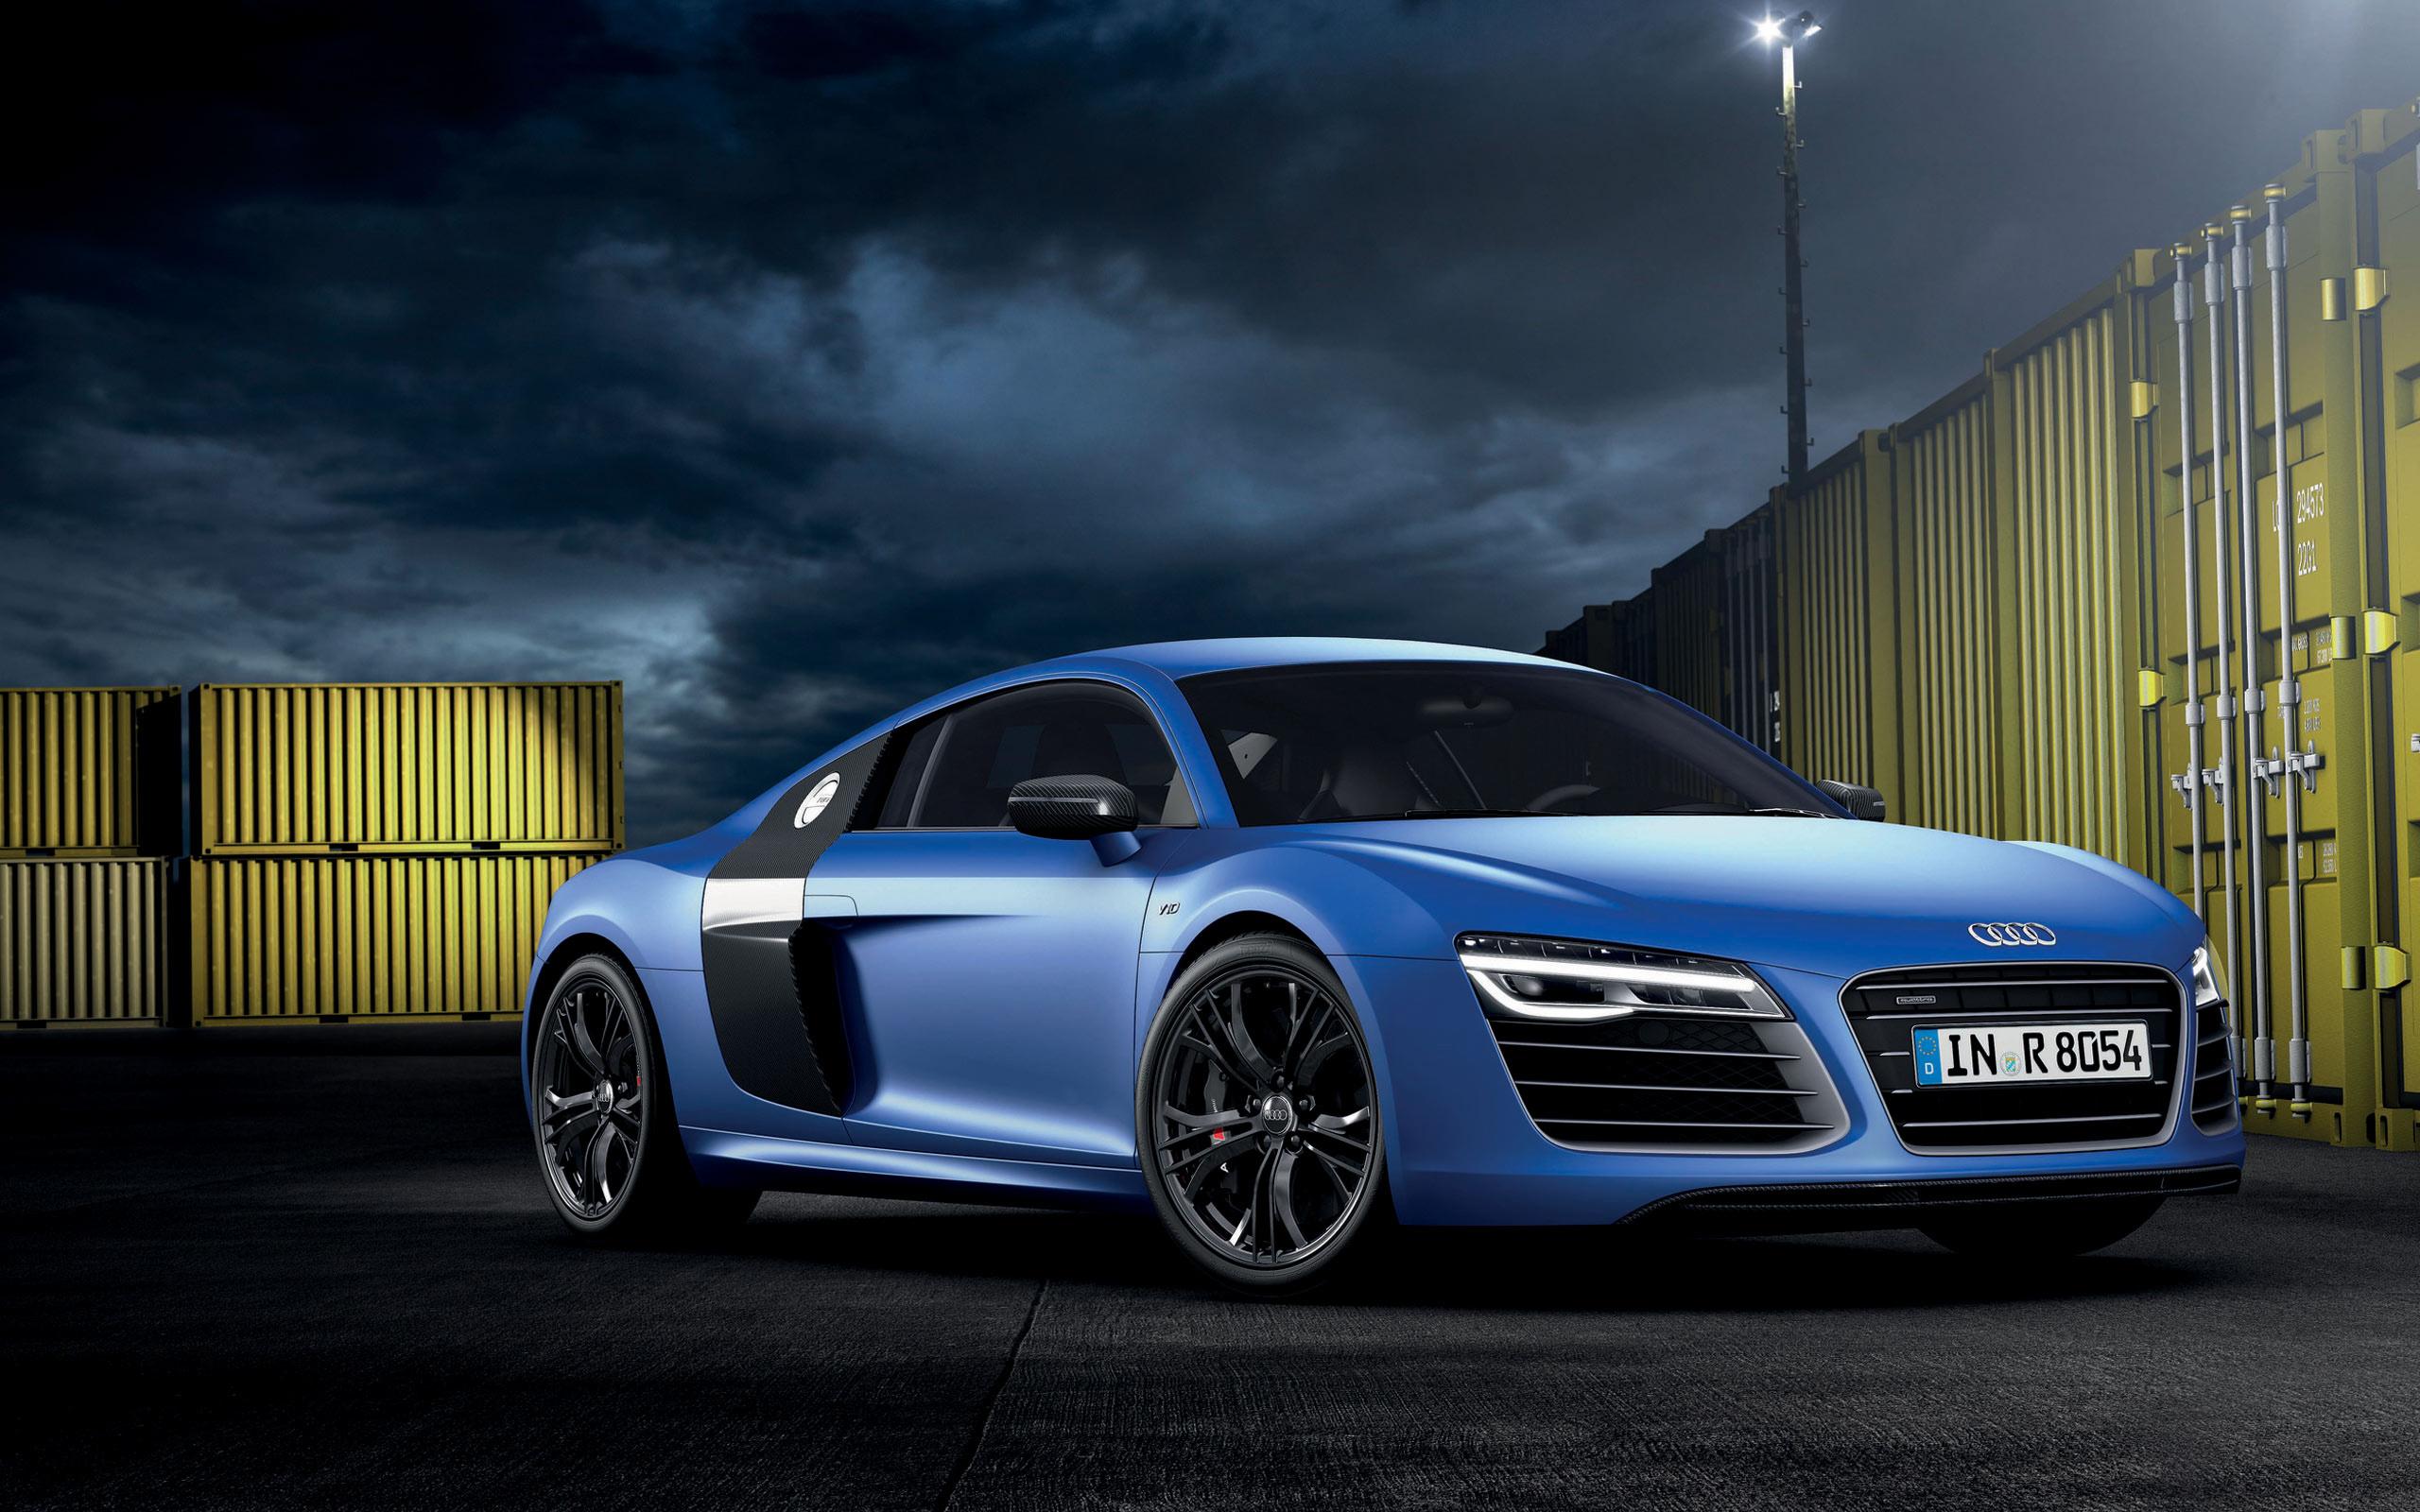 Audi R8 Hd Widescreen Wallpapers 1080p Audi R8 V10 Plus Wallpaper Hd Car Wallpapers Id 3114